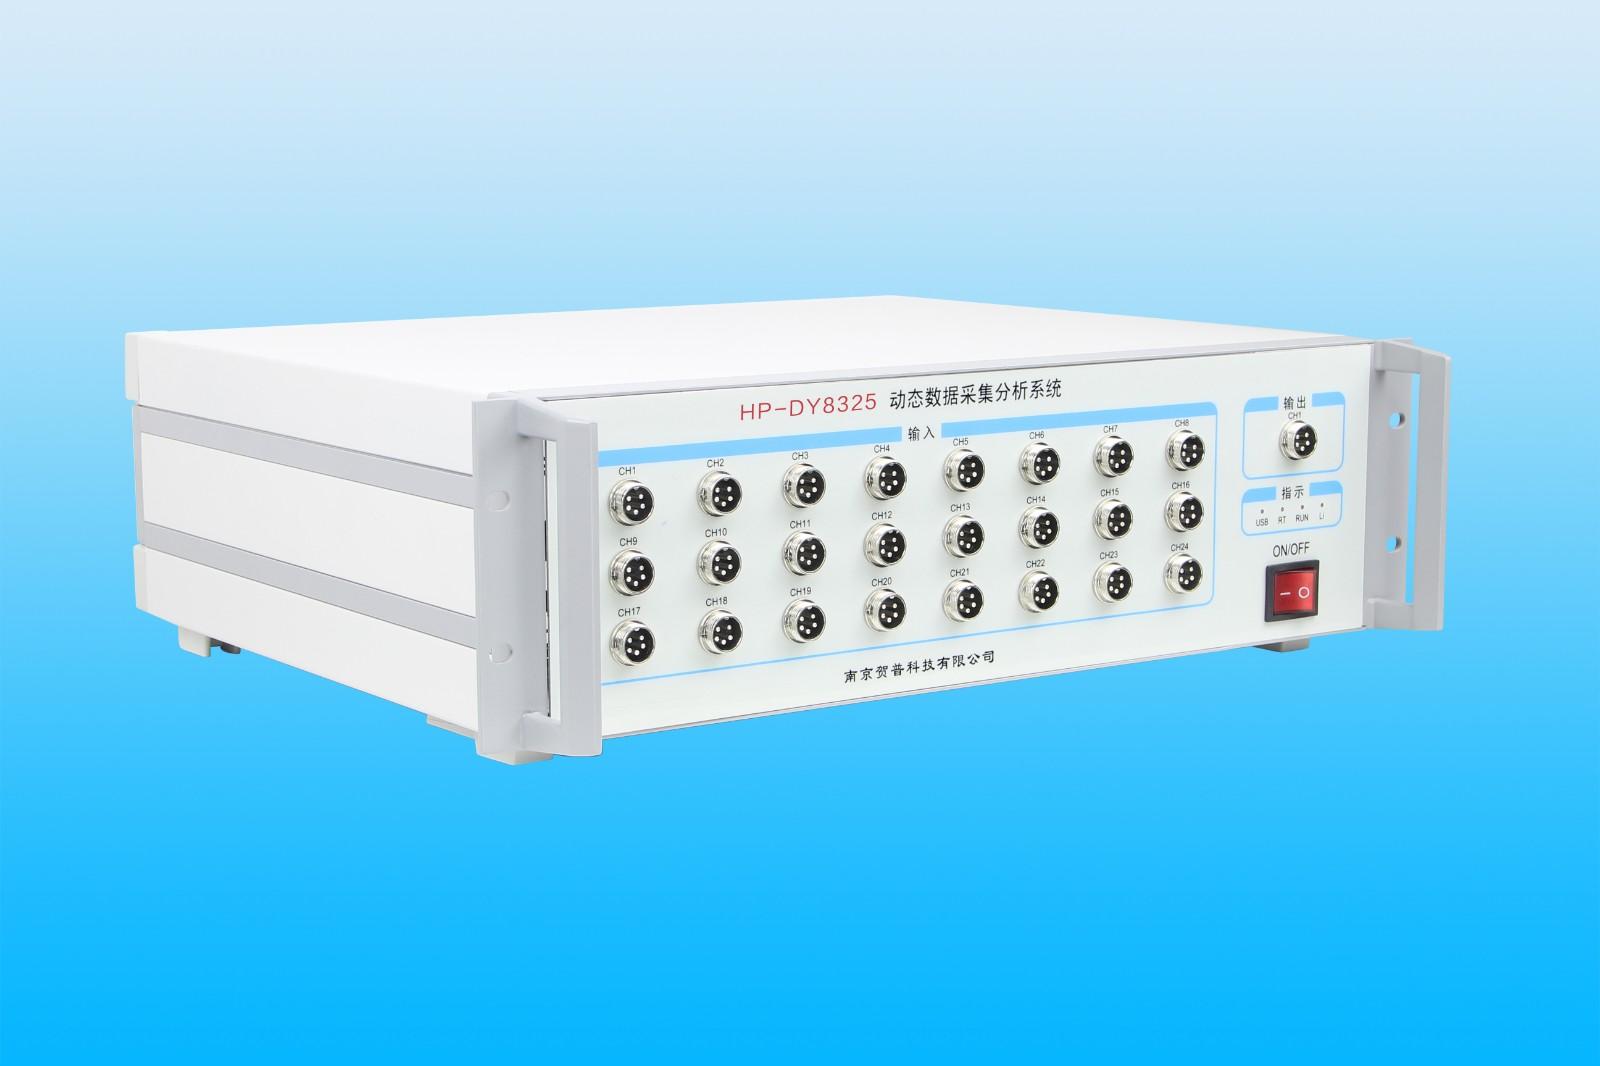 HP-DY8325 动态优发国际顶级在线应变测试分析系统